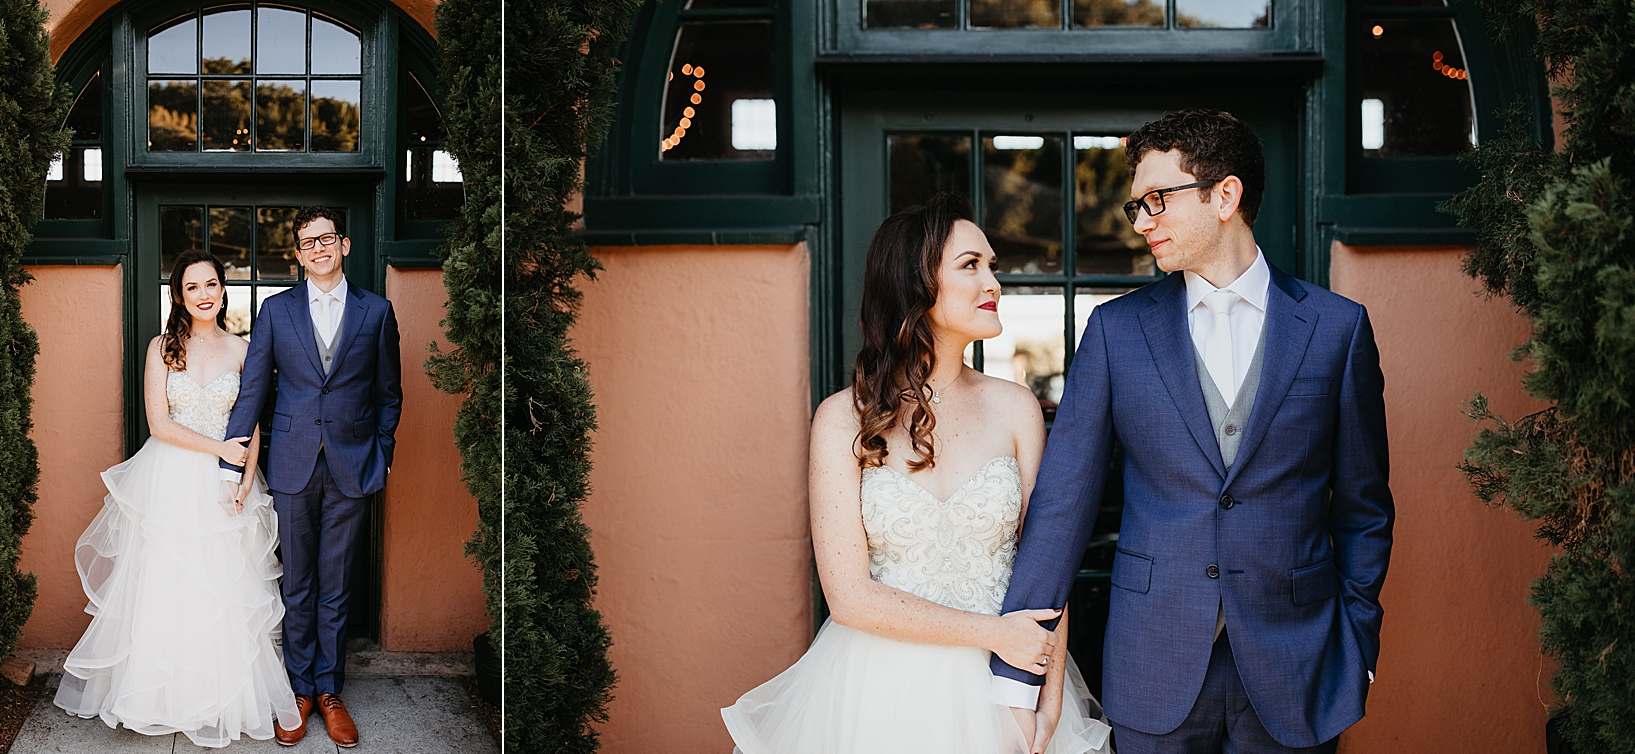 Brick-San-Diego-Winter-Wedding-36.jpg